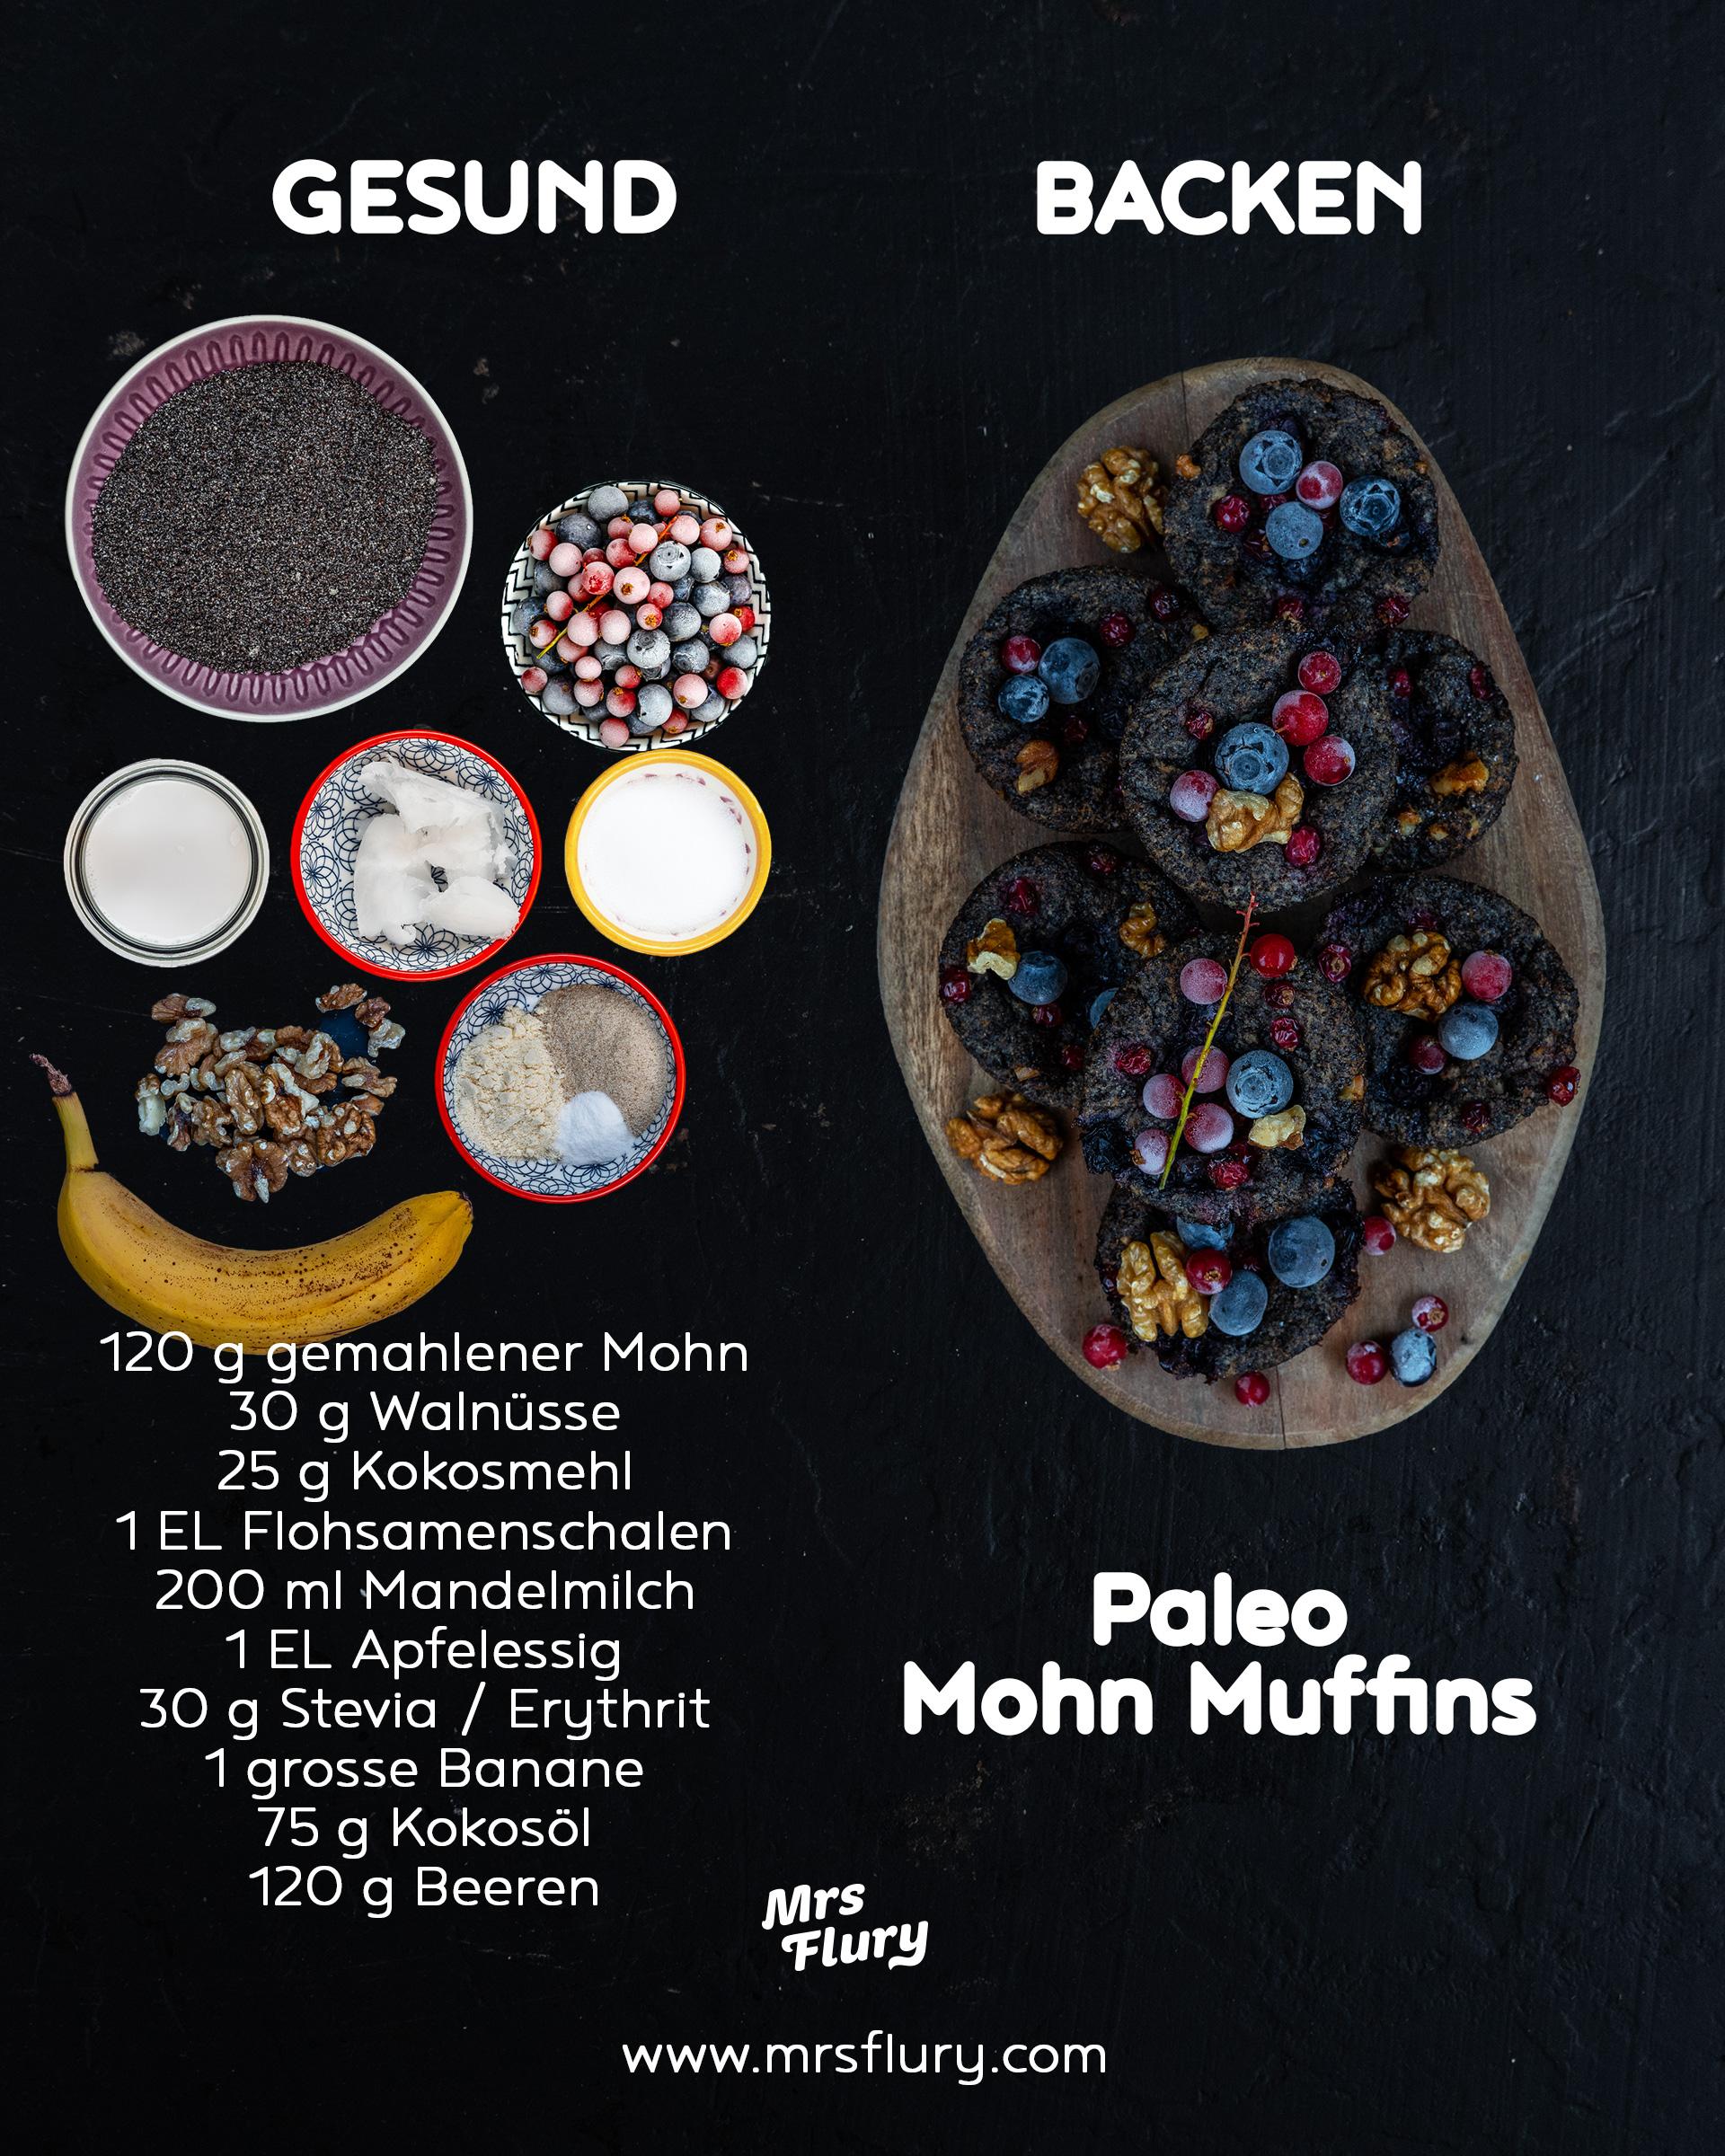 Gesunde Paleo Mohn Muffins vegan Mrs Flury